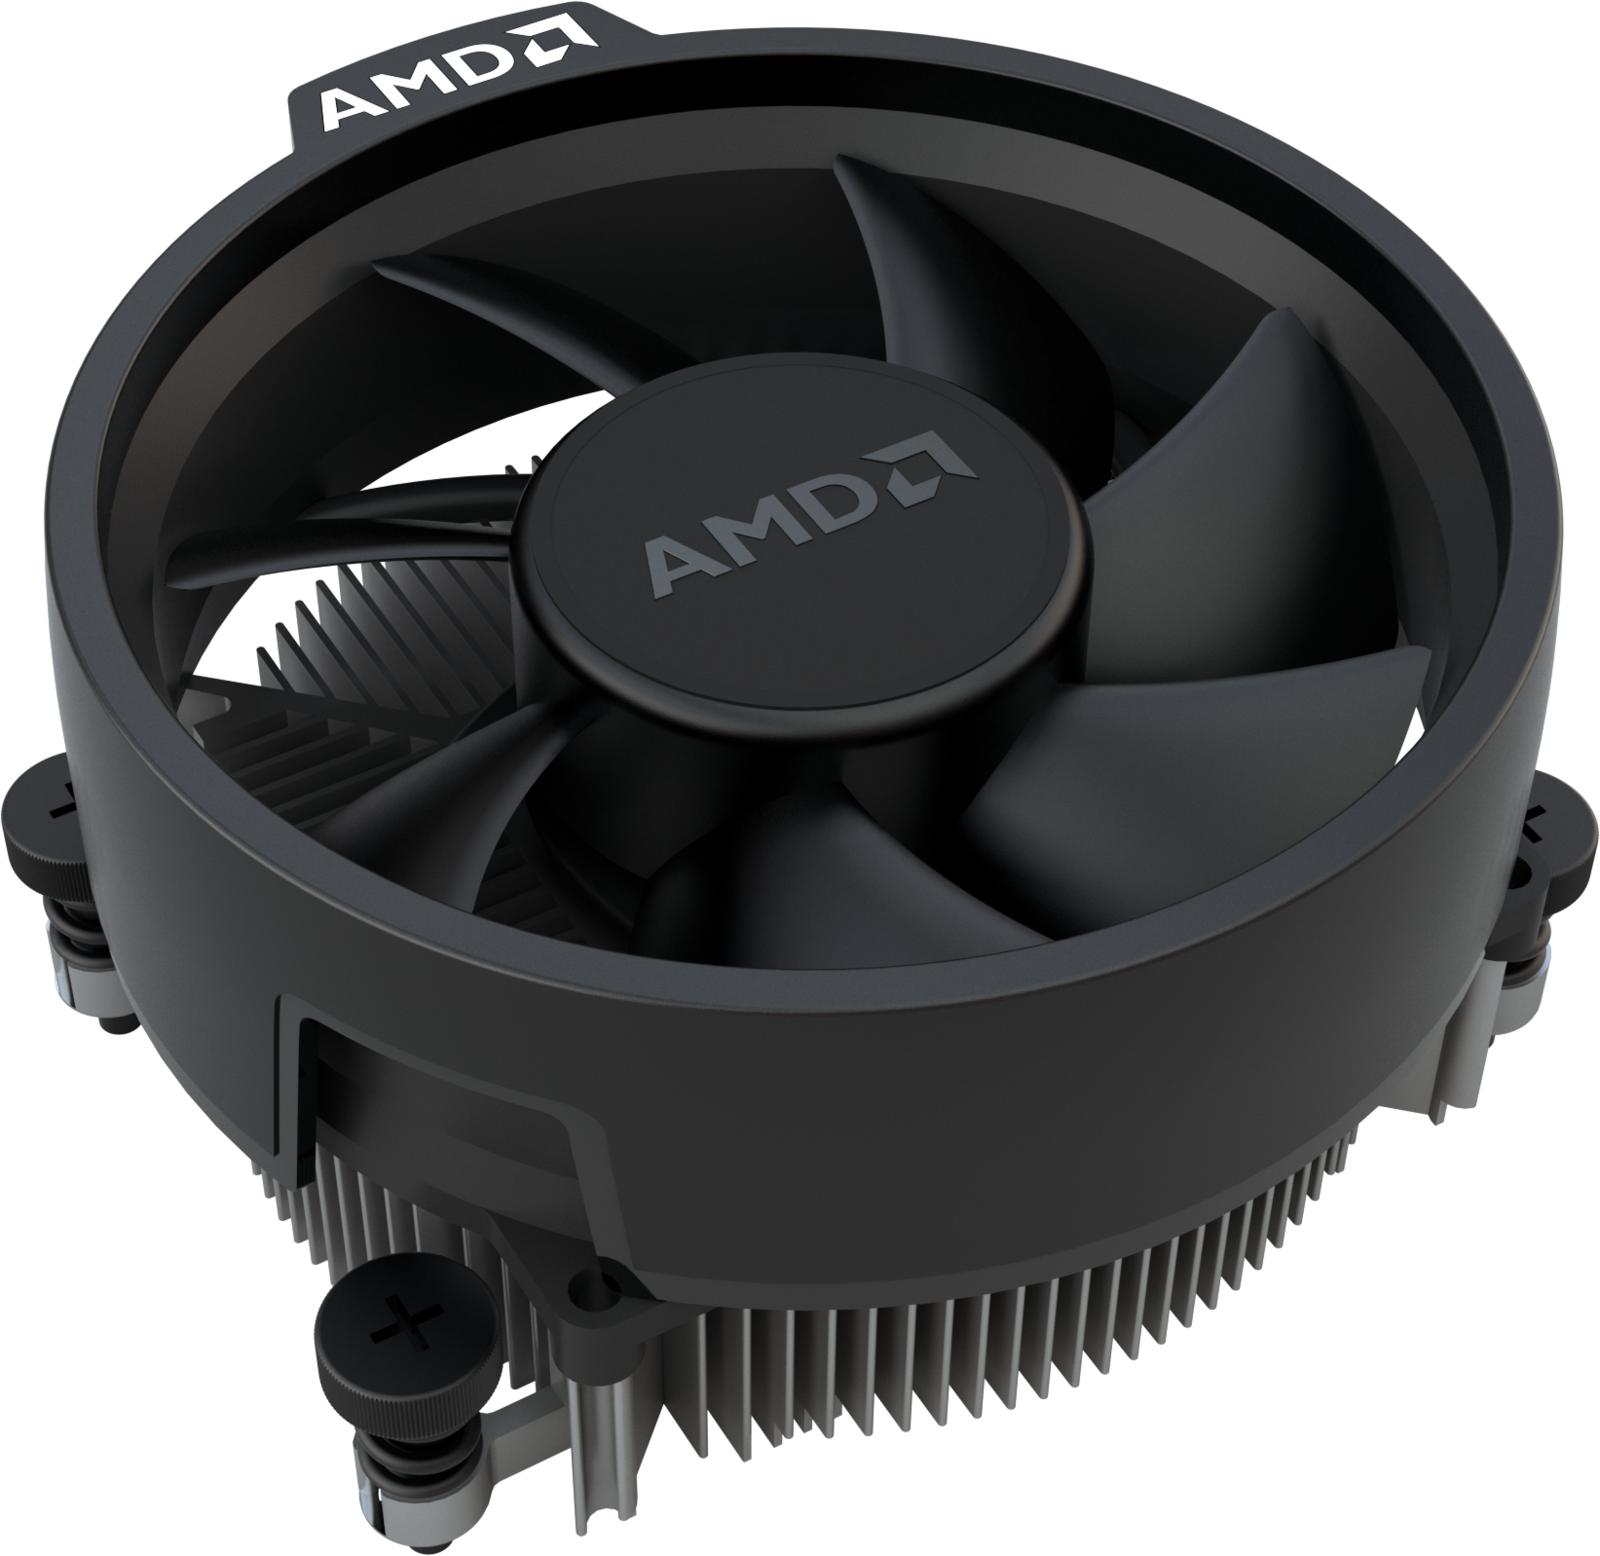 AMD Ryzen 3 3100 4-Core 3.6GHz CPU image